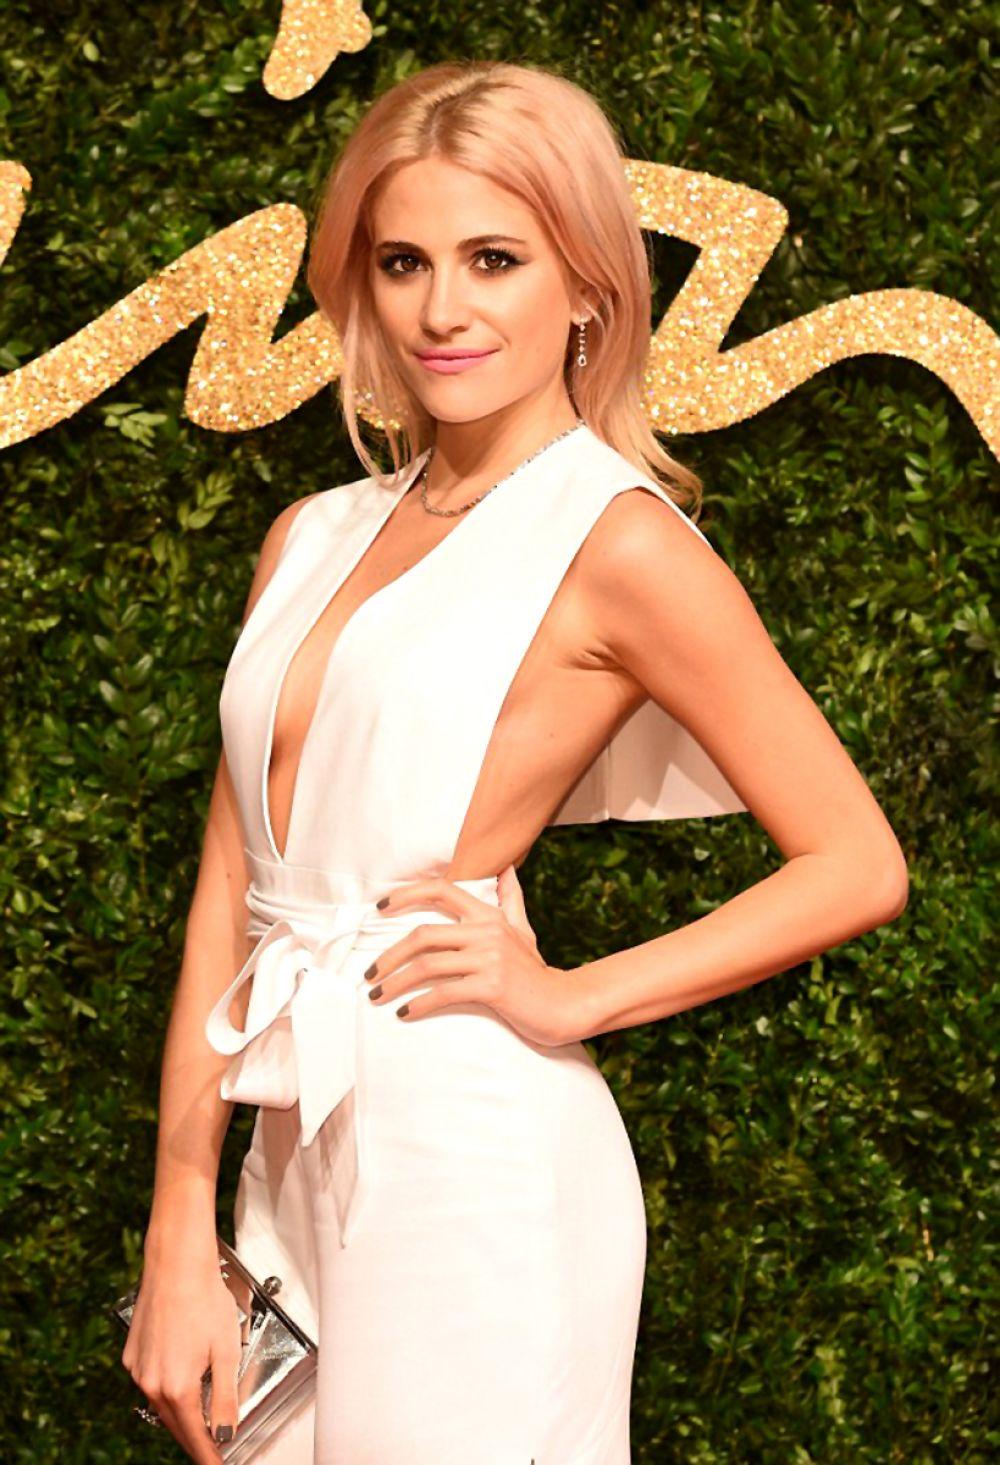 PIXIE LOTT at 2015 British Fashion Awards in London 11/23/2015